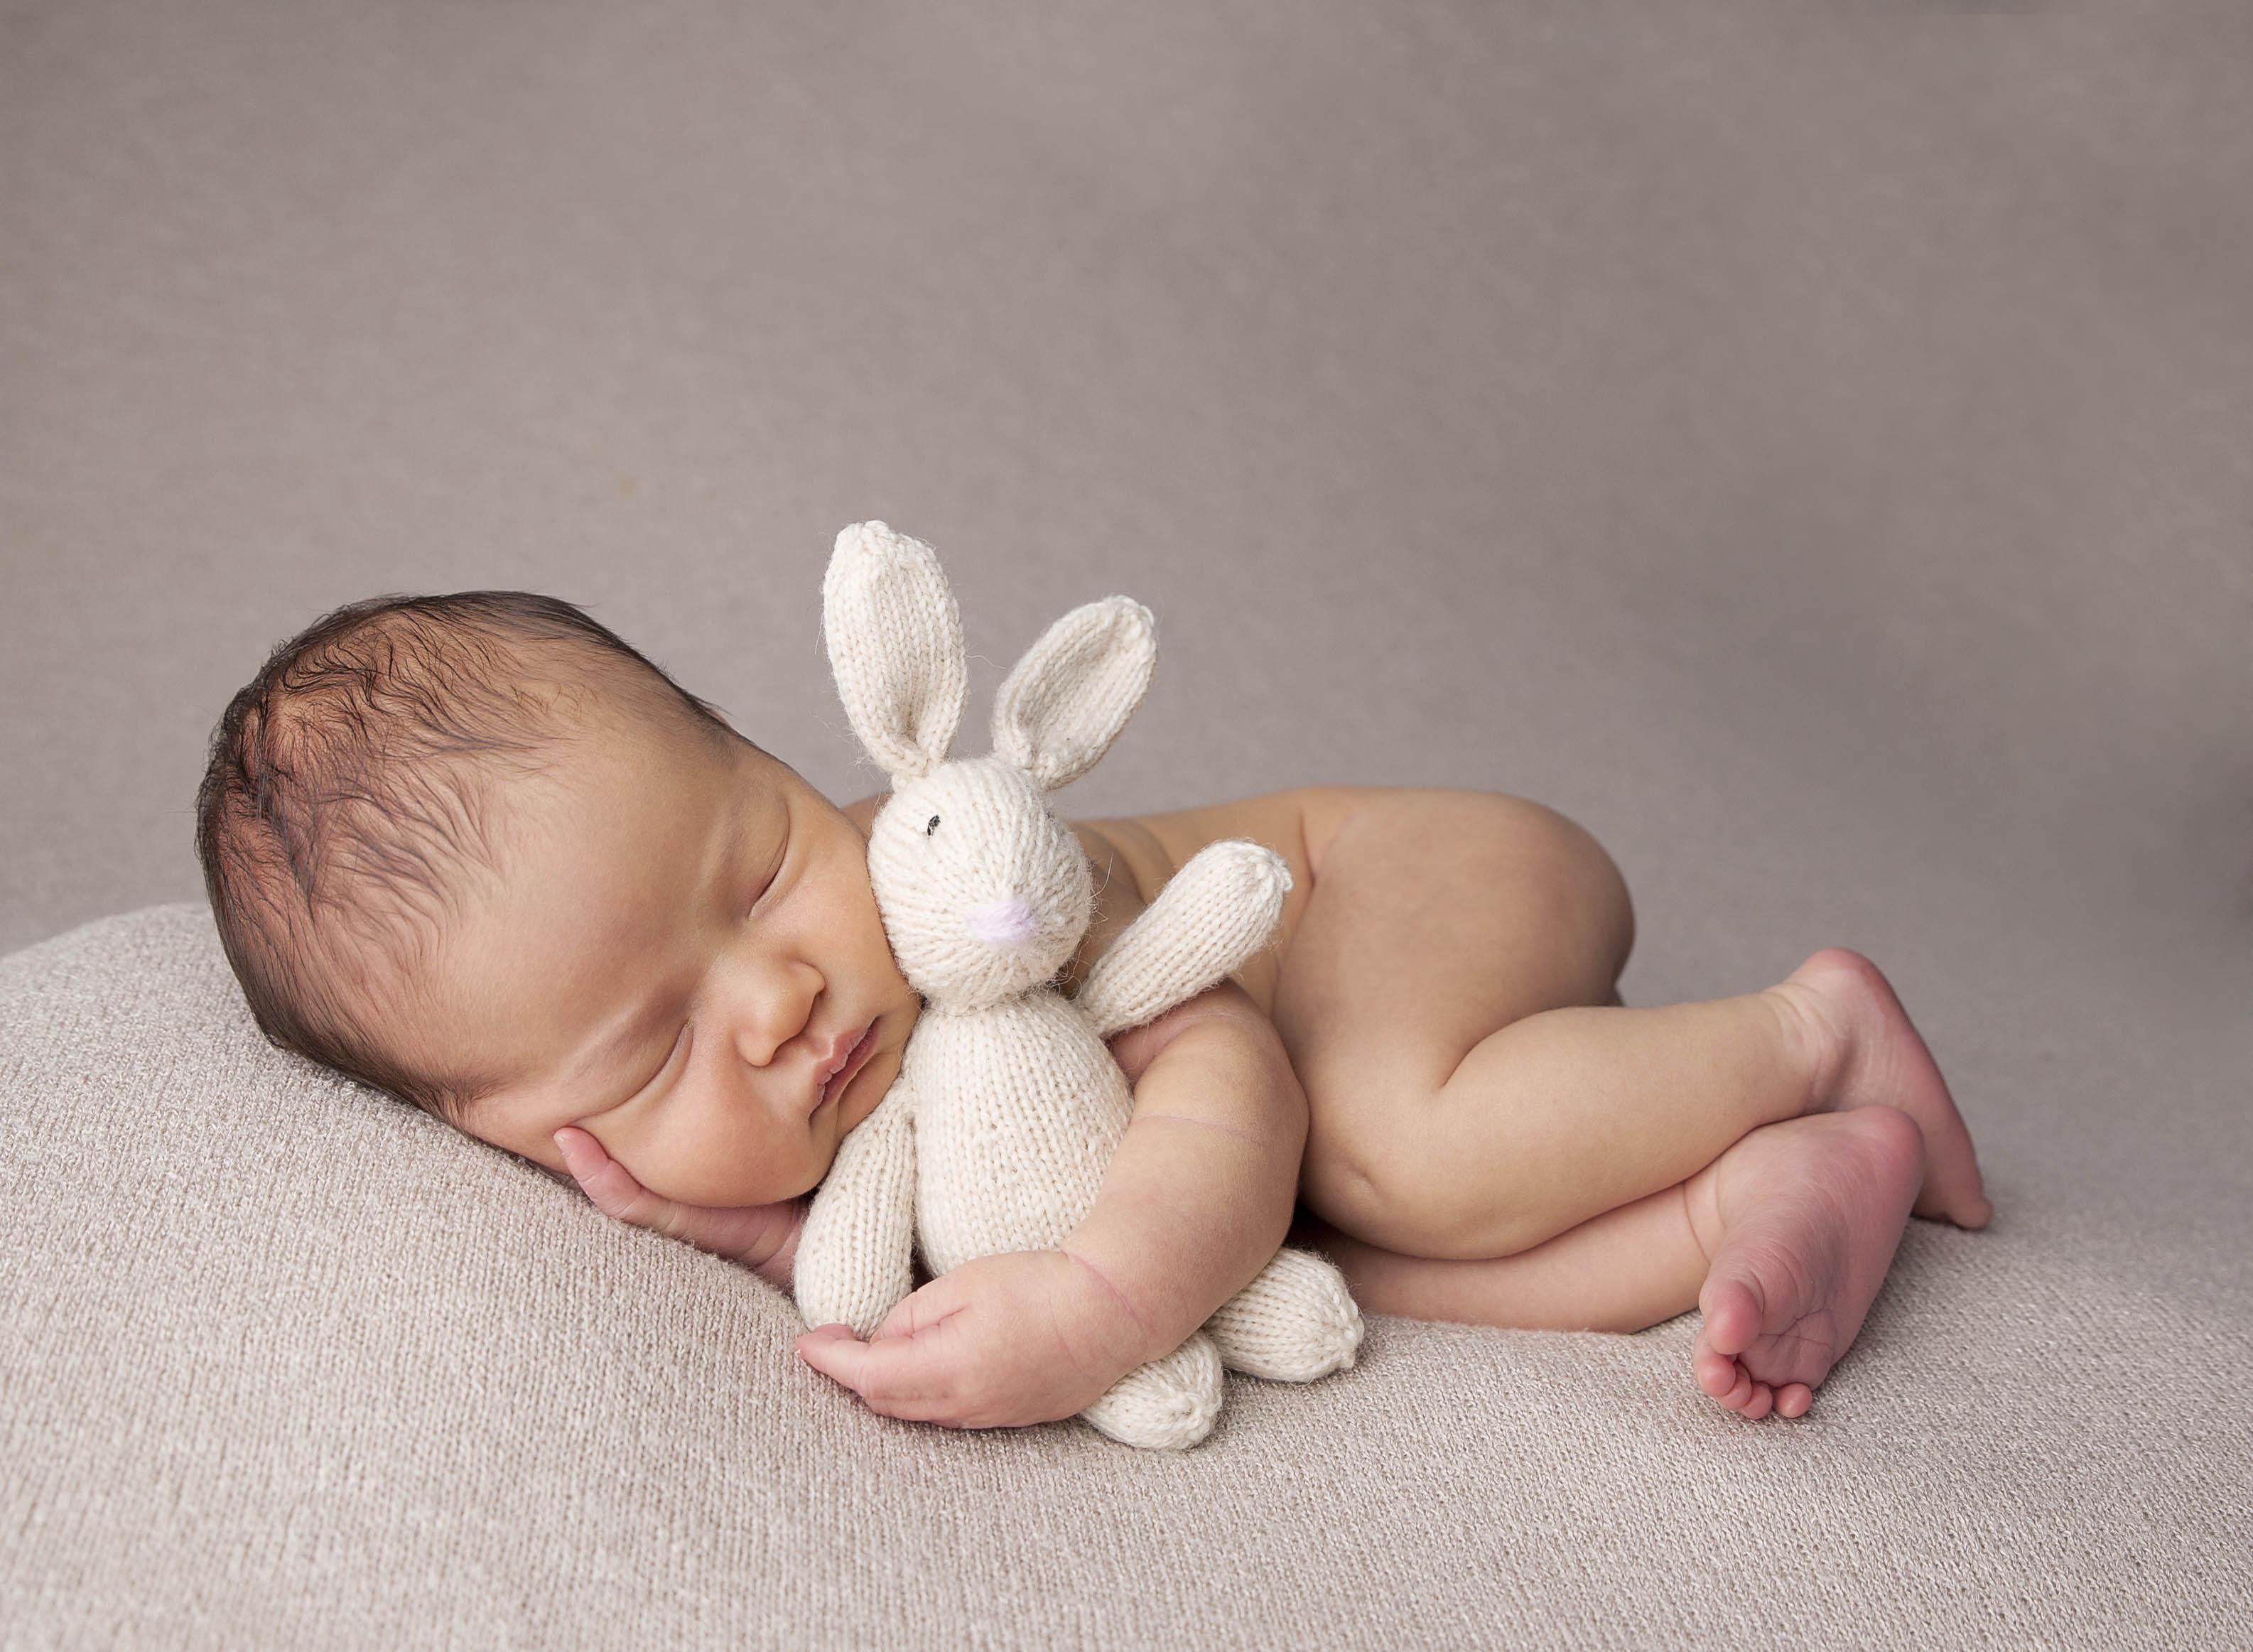 baby holding stuffy comox